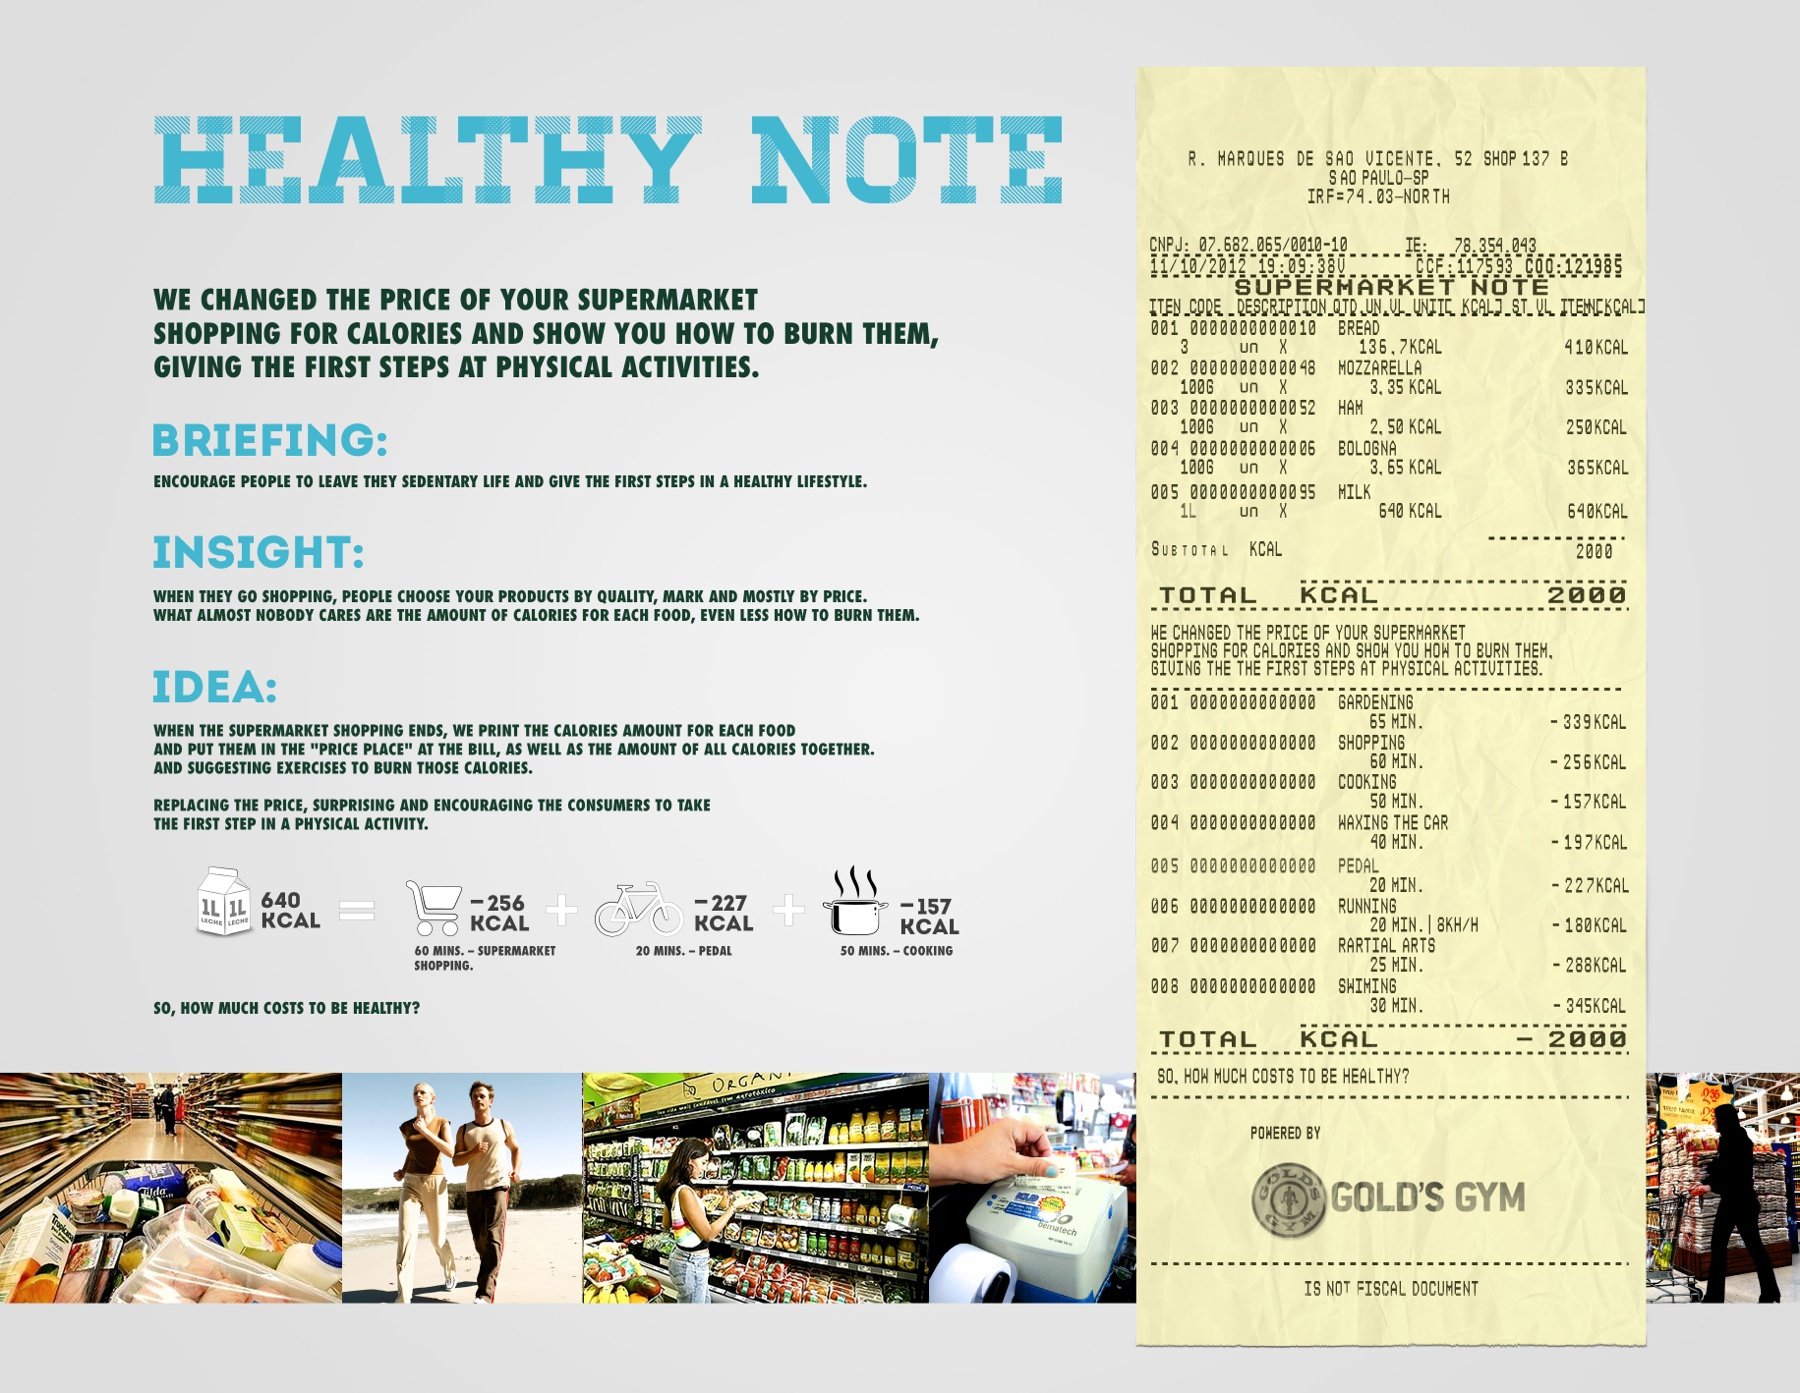 Golds-Gym-Health-Note.jpg